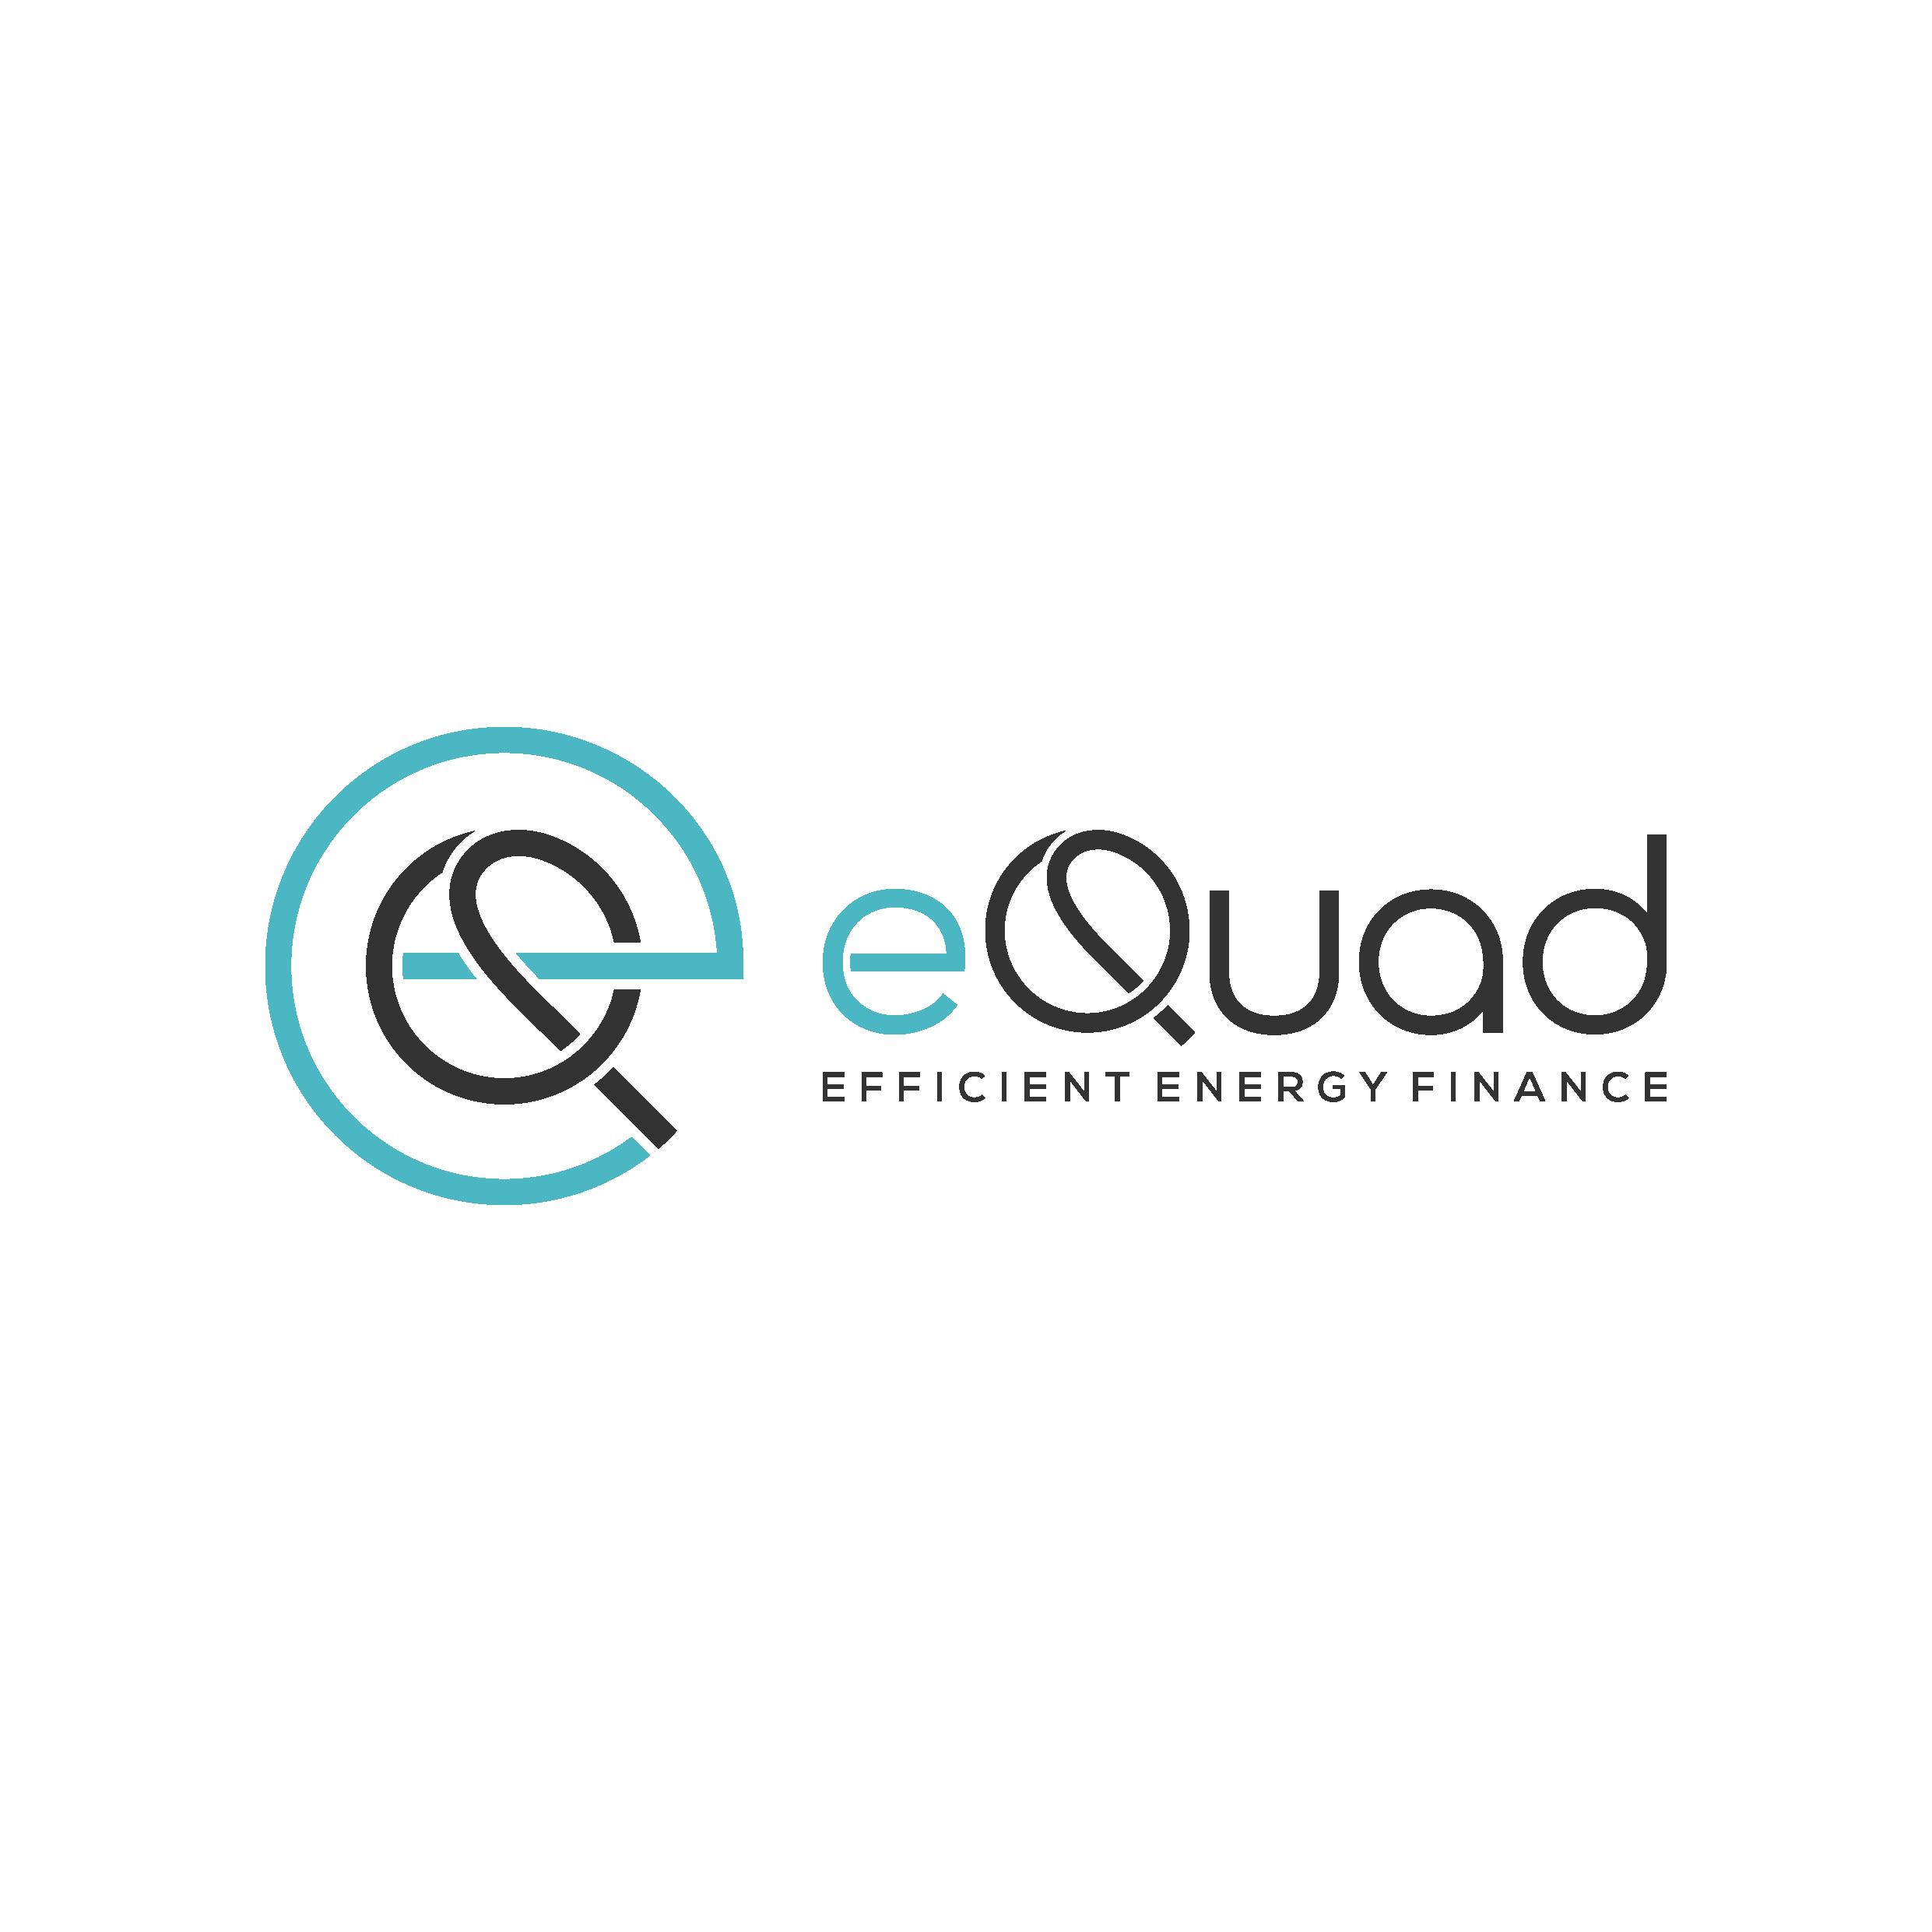 Design a logo for a groundbreaking energy finance web platform.